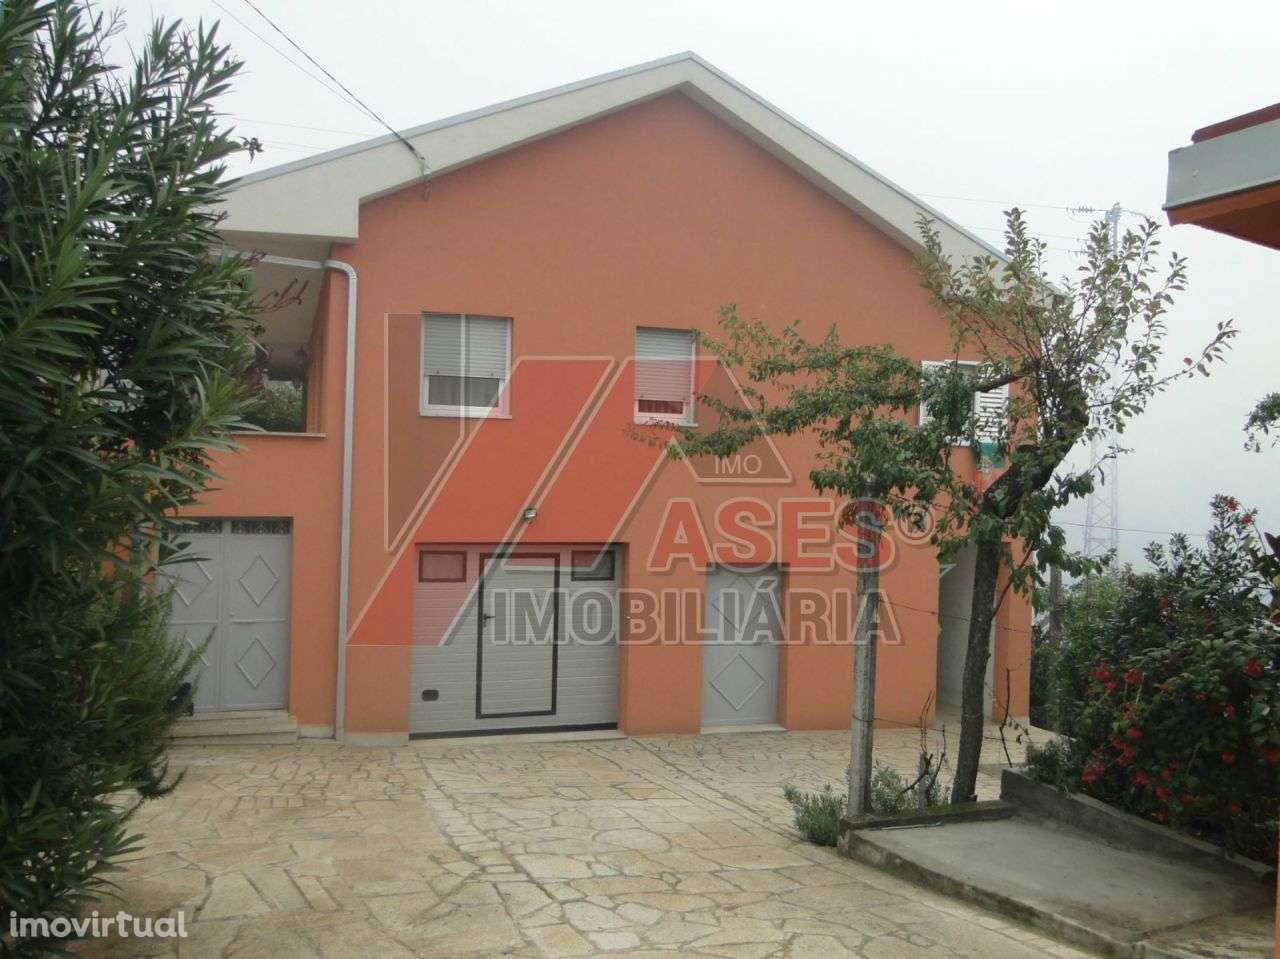 Moradia para comprar, Mondim de Basto, Vila Real - Foto 1